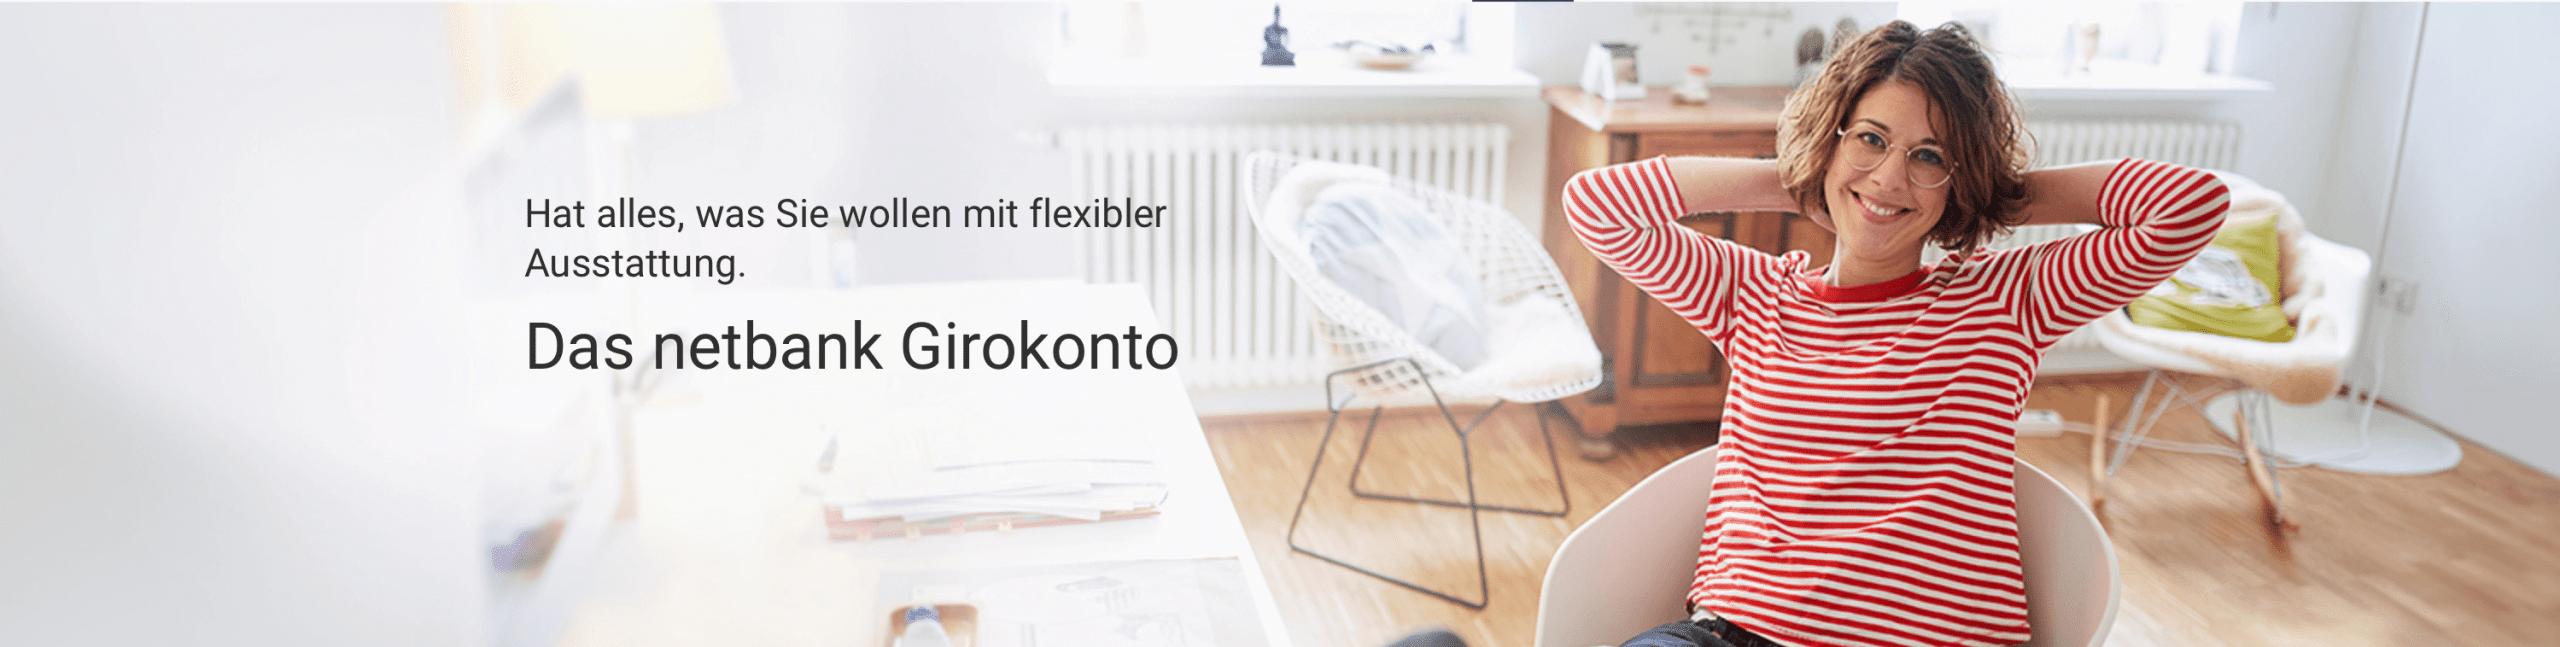 Netbank Girokonto - Header